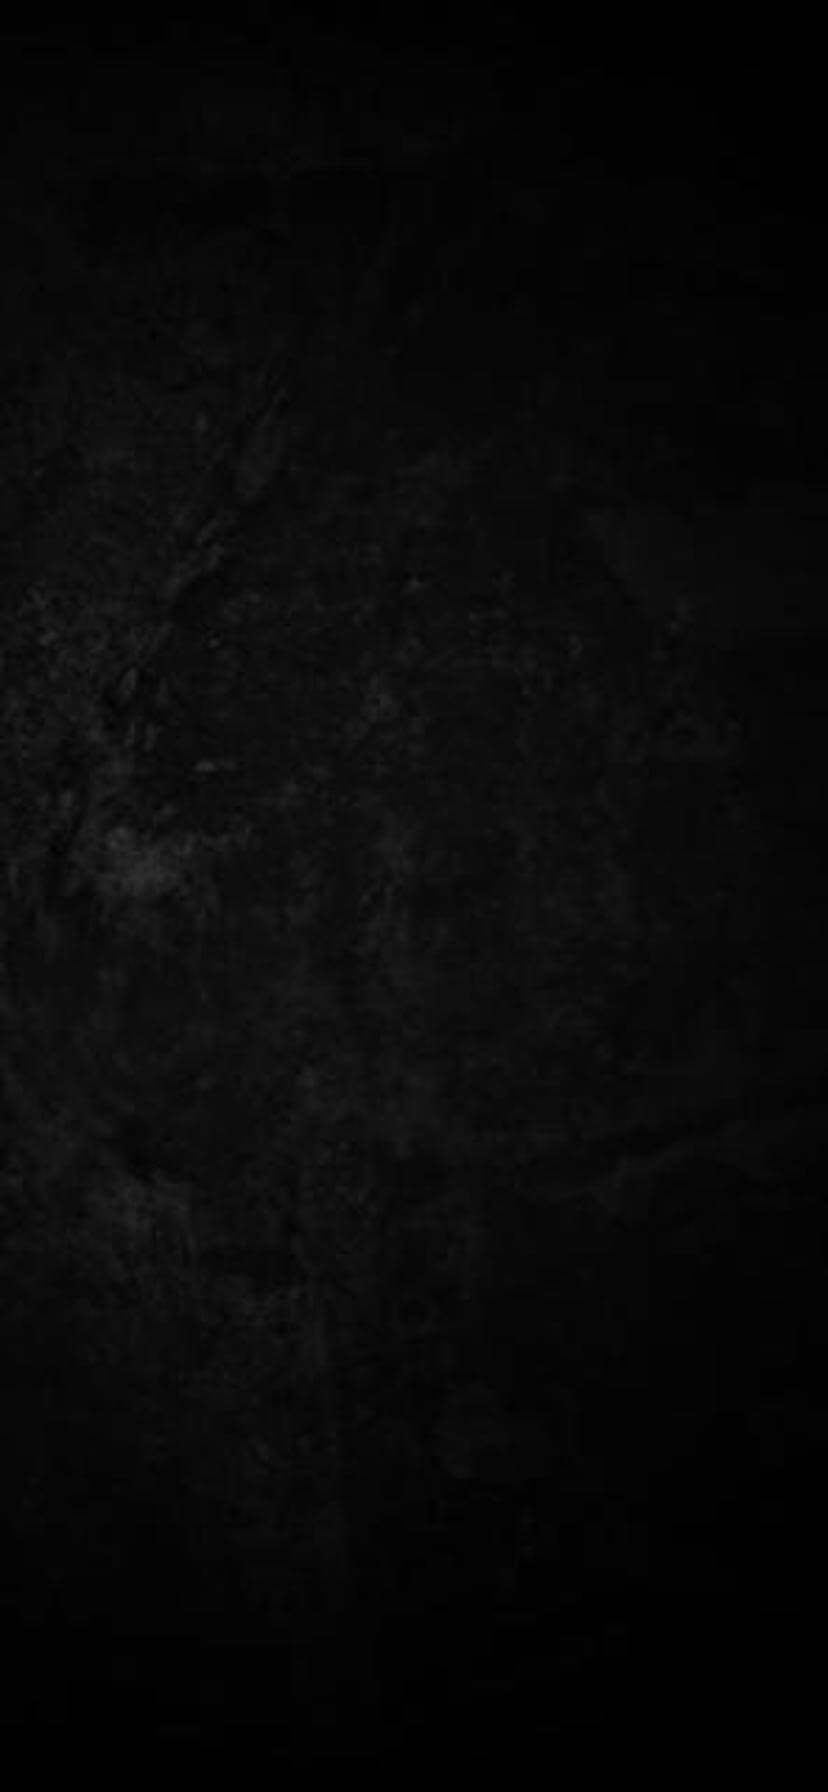 iPhone Xs Max Dark HD 4k Wallpapers - Wallpaper Cave